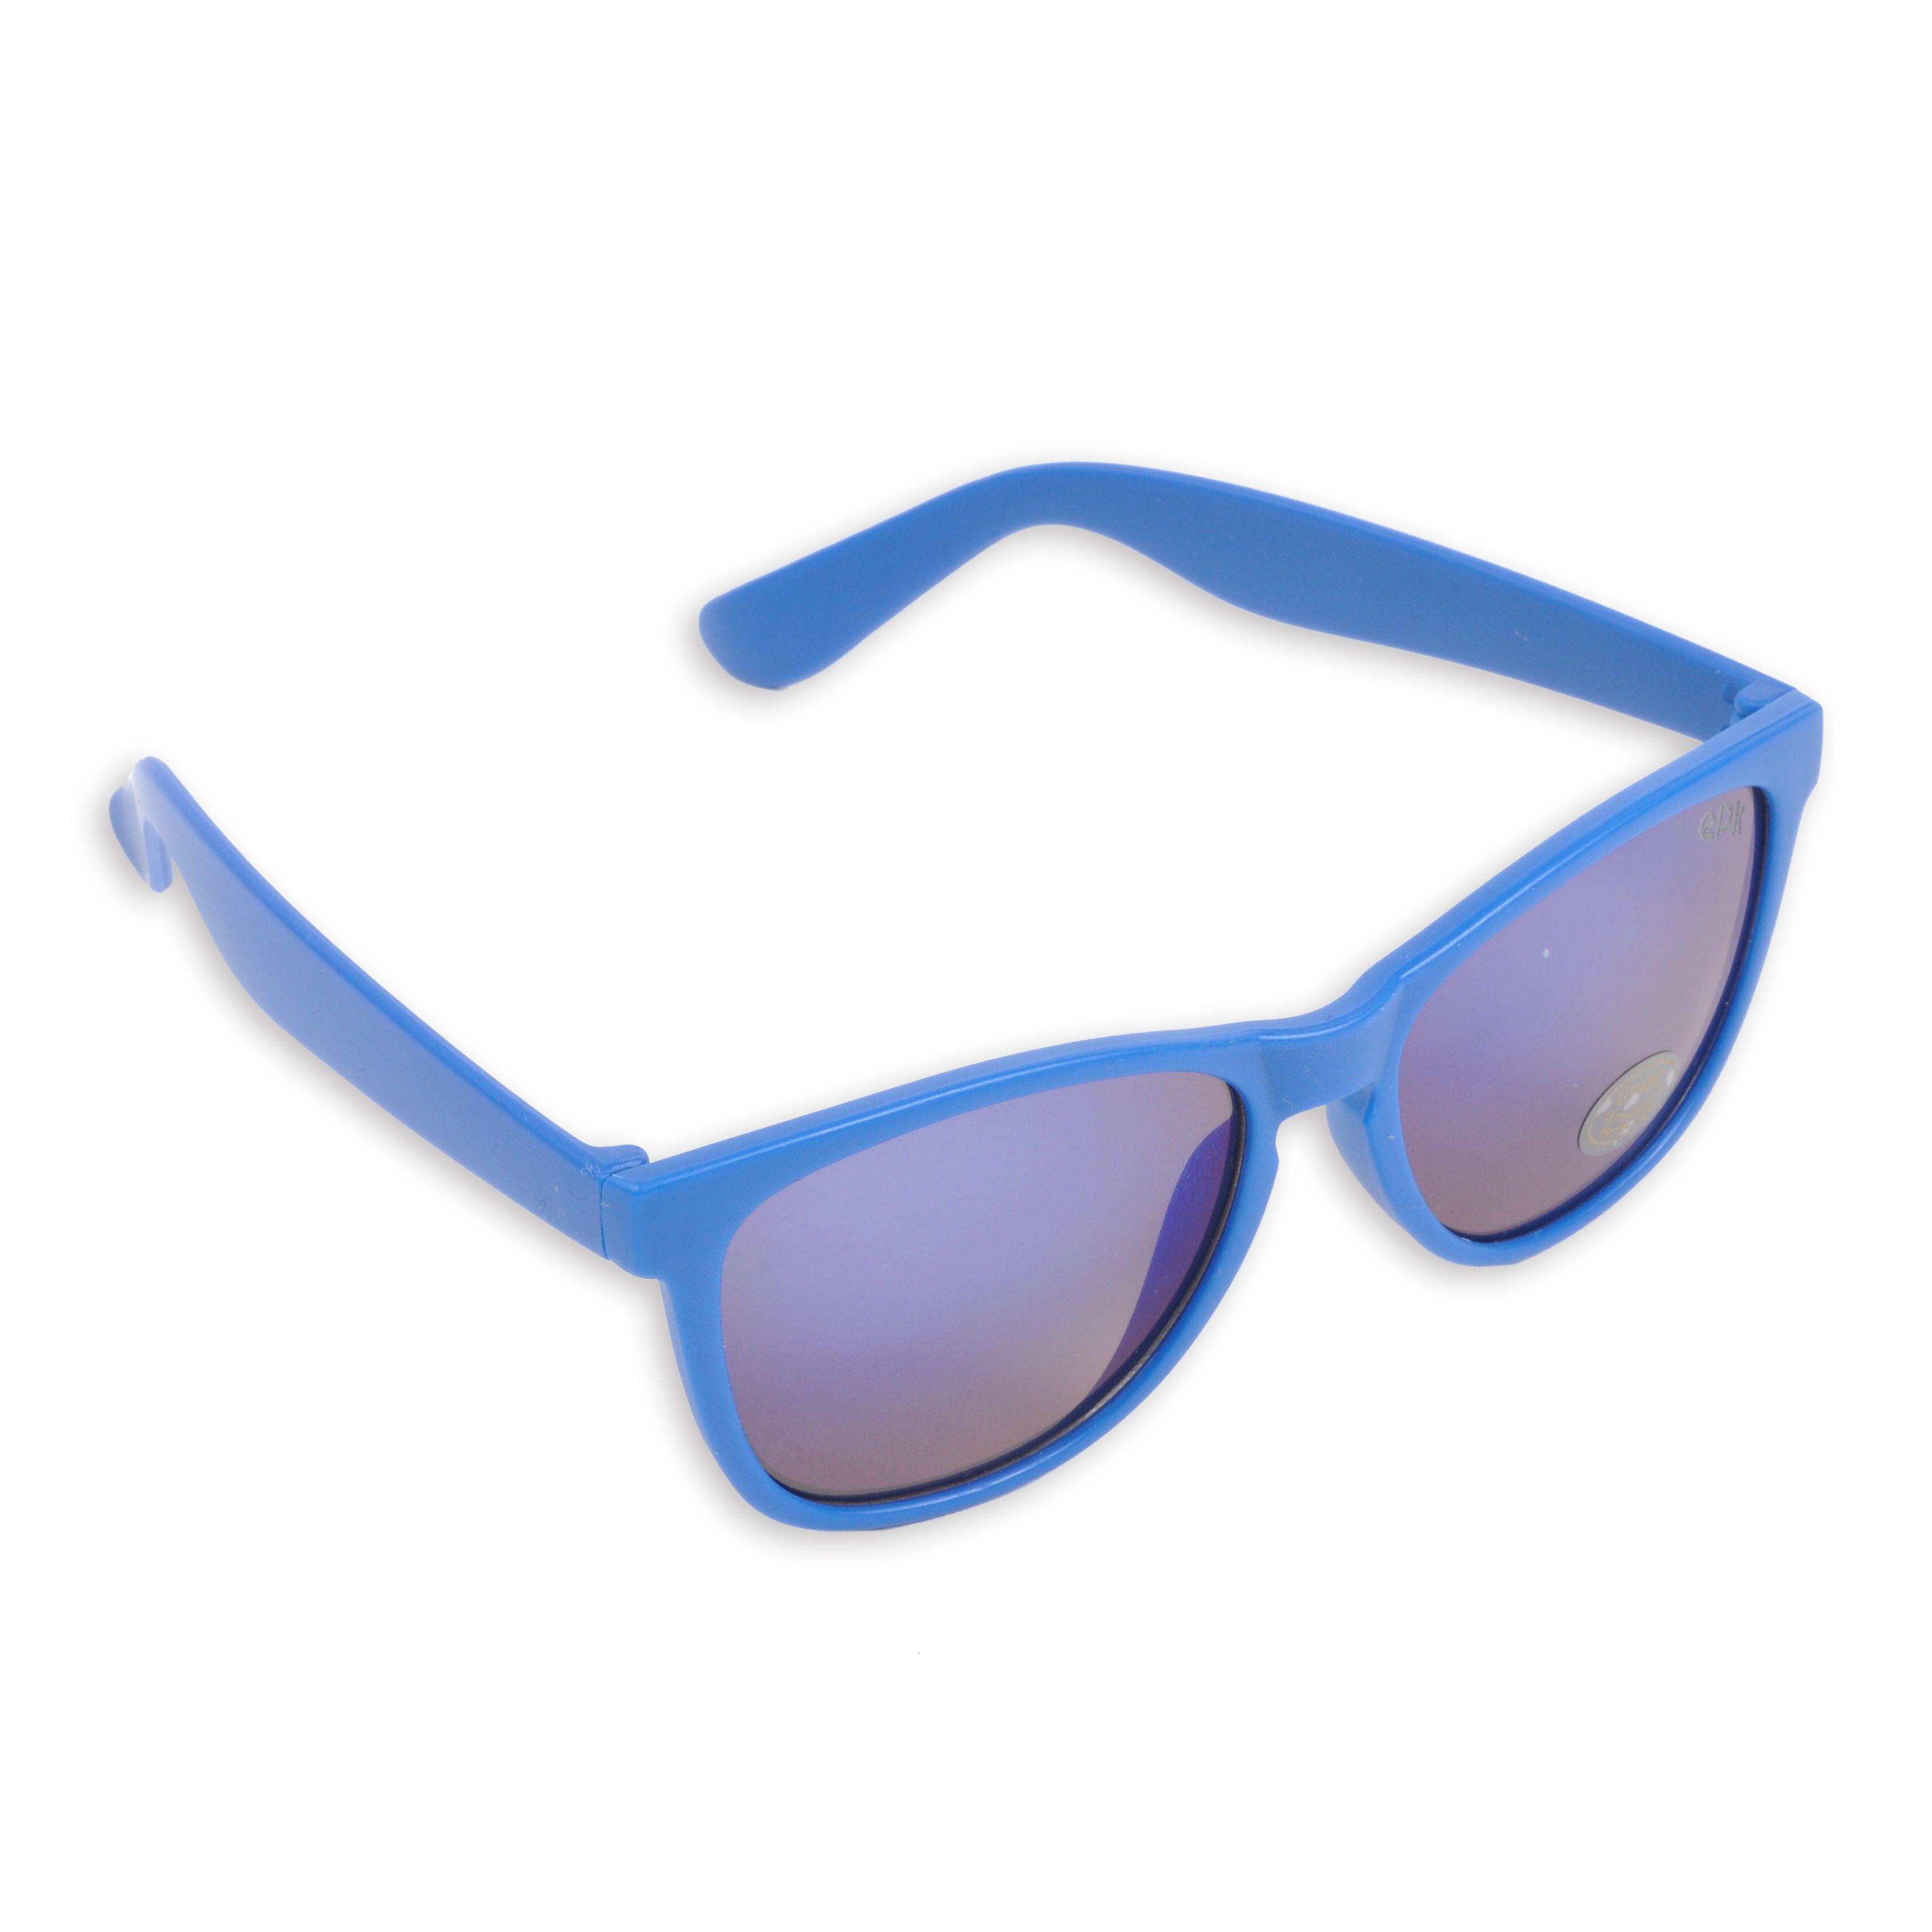 8c4efe3e19 Lentes EPK de sol para niño en color azul. | ROPA NIÑO | Lentes de ...